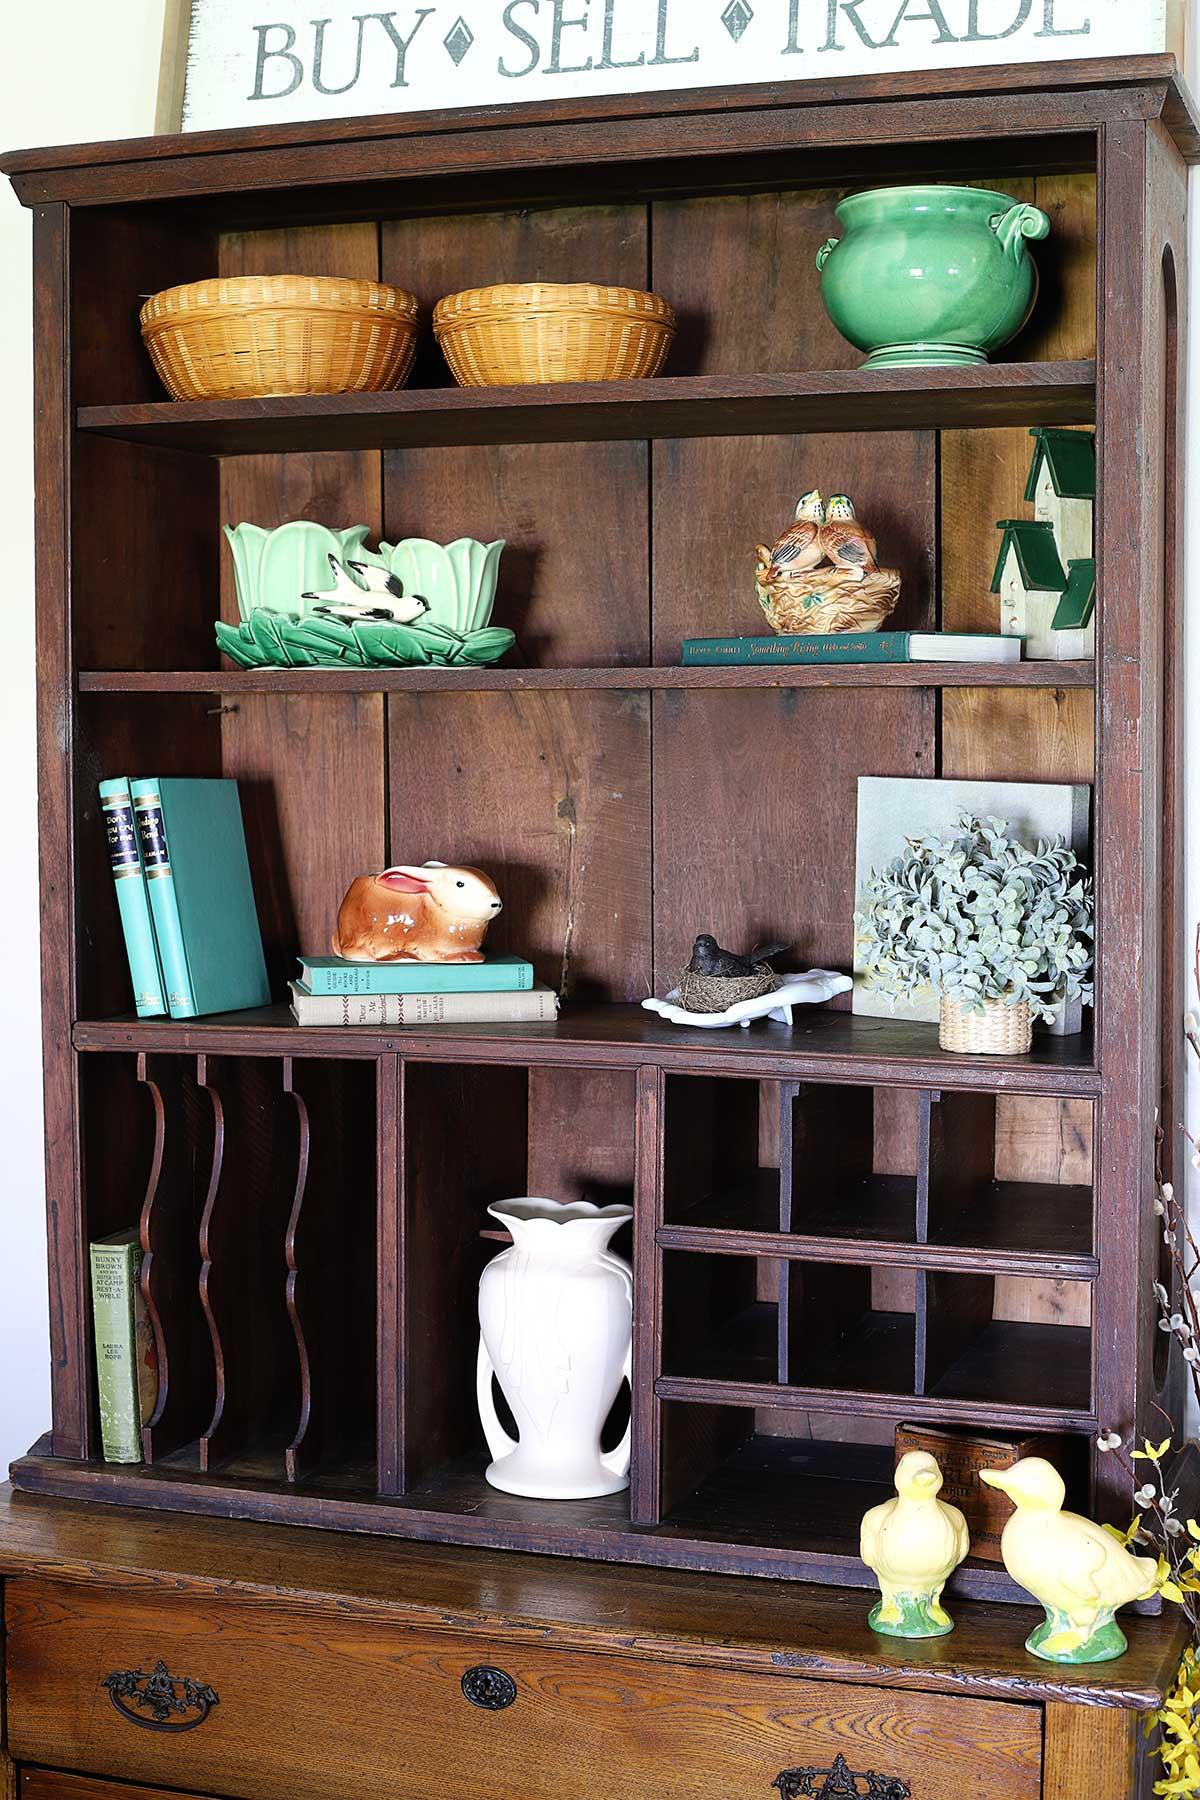 adding spring decor on the bookshelf